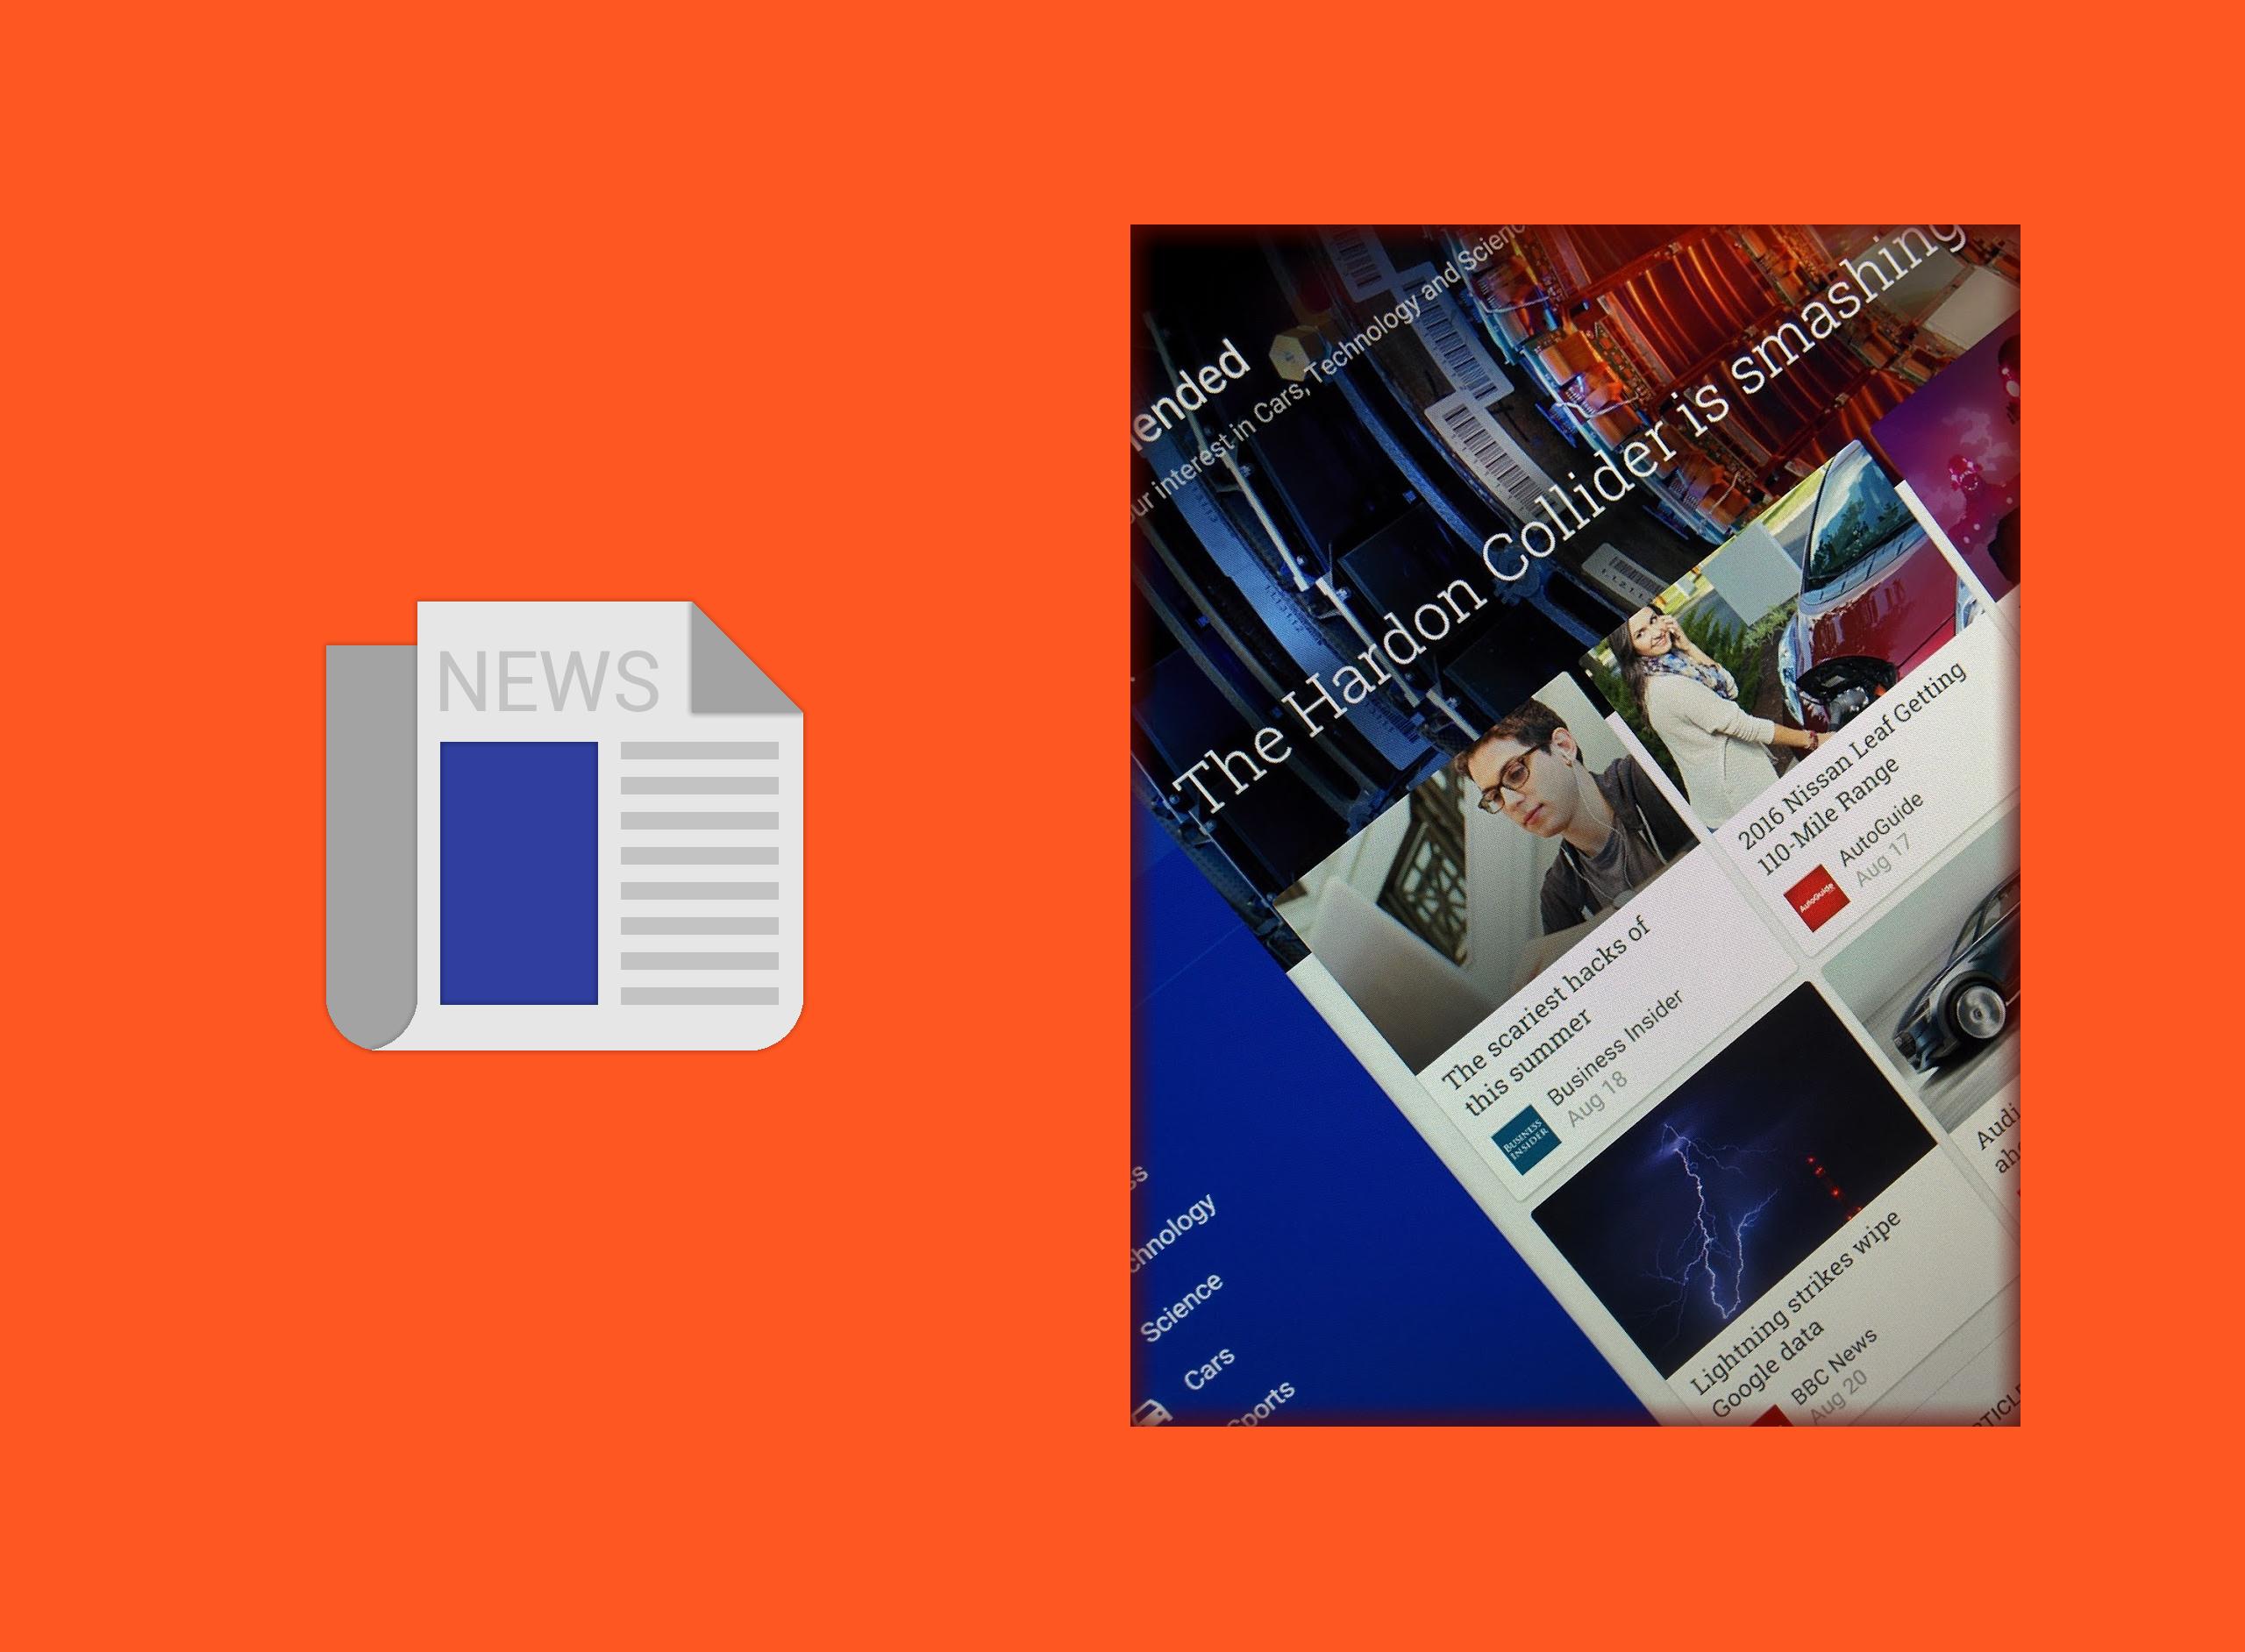 Windows 10 google news app teaser 3 by wwsalmon on deviantart